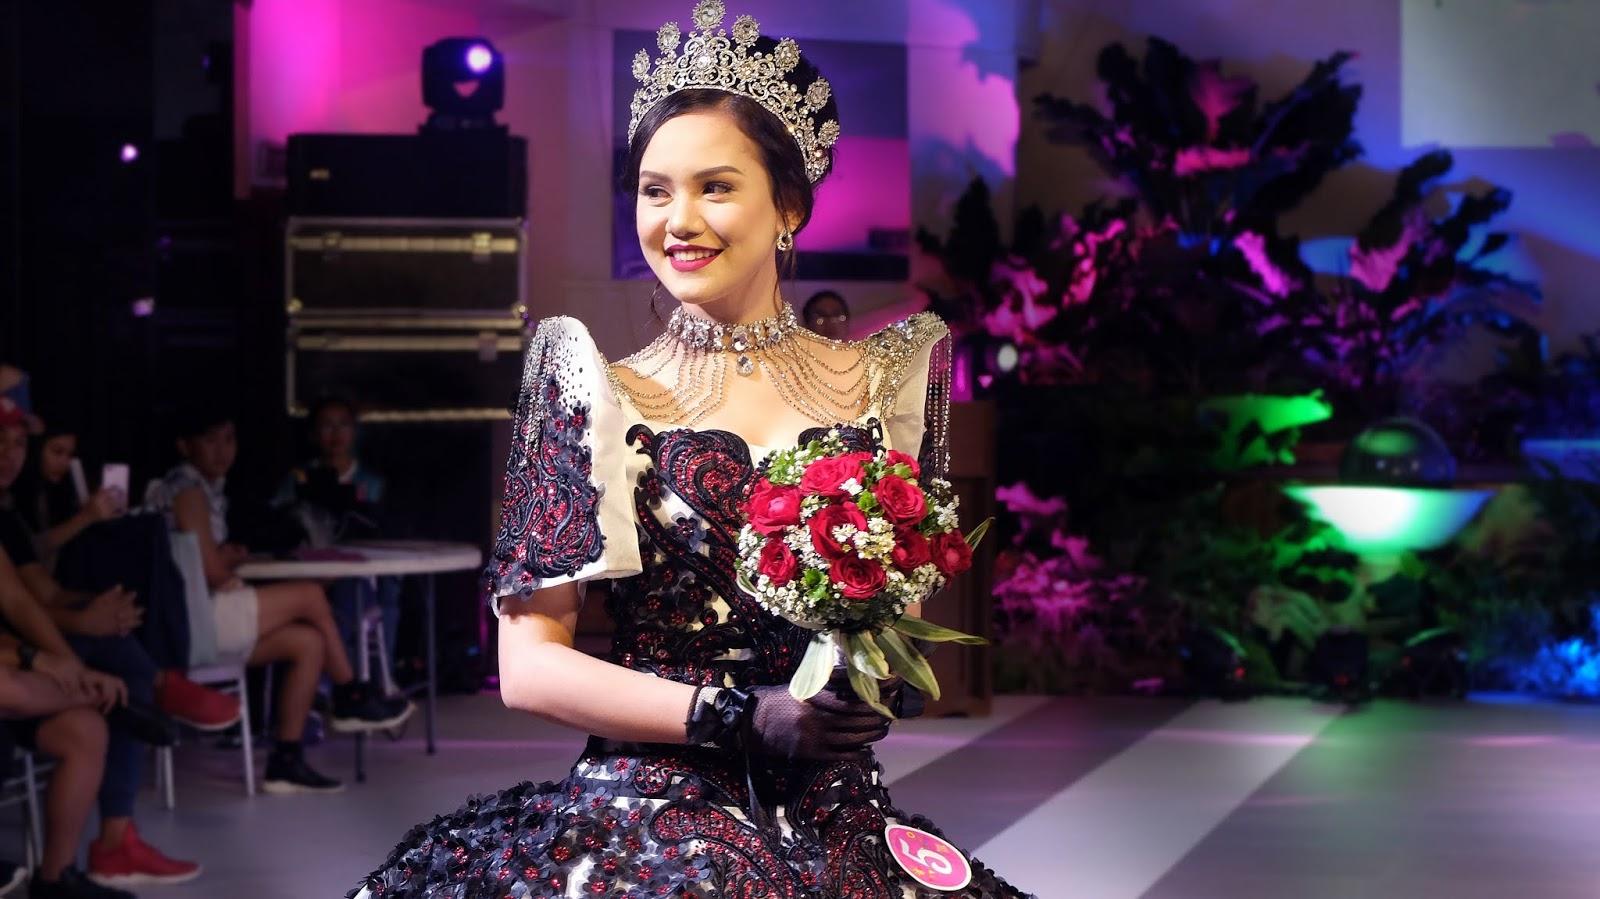 T'nalak Festival of Koronadal South Cotabato Angelica Baird Federico Navarro Bryan Cabaddu Festival de las Bellas y Flores Gown Competition National Costume